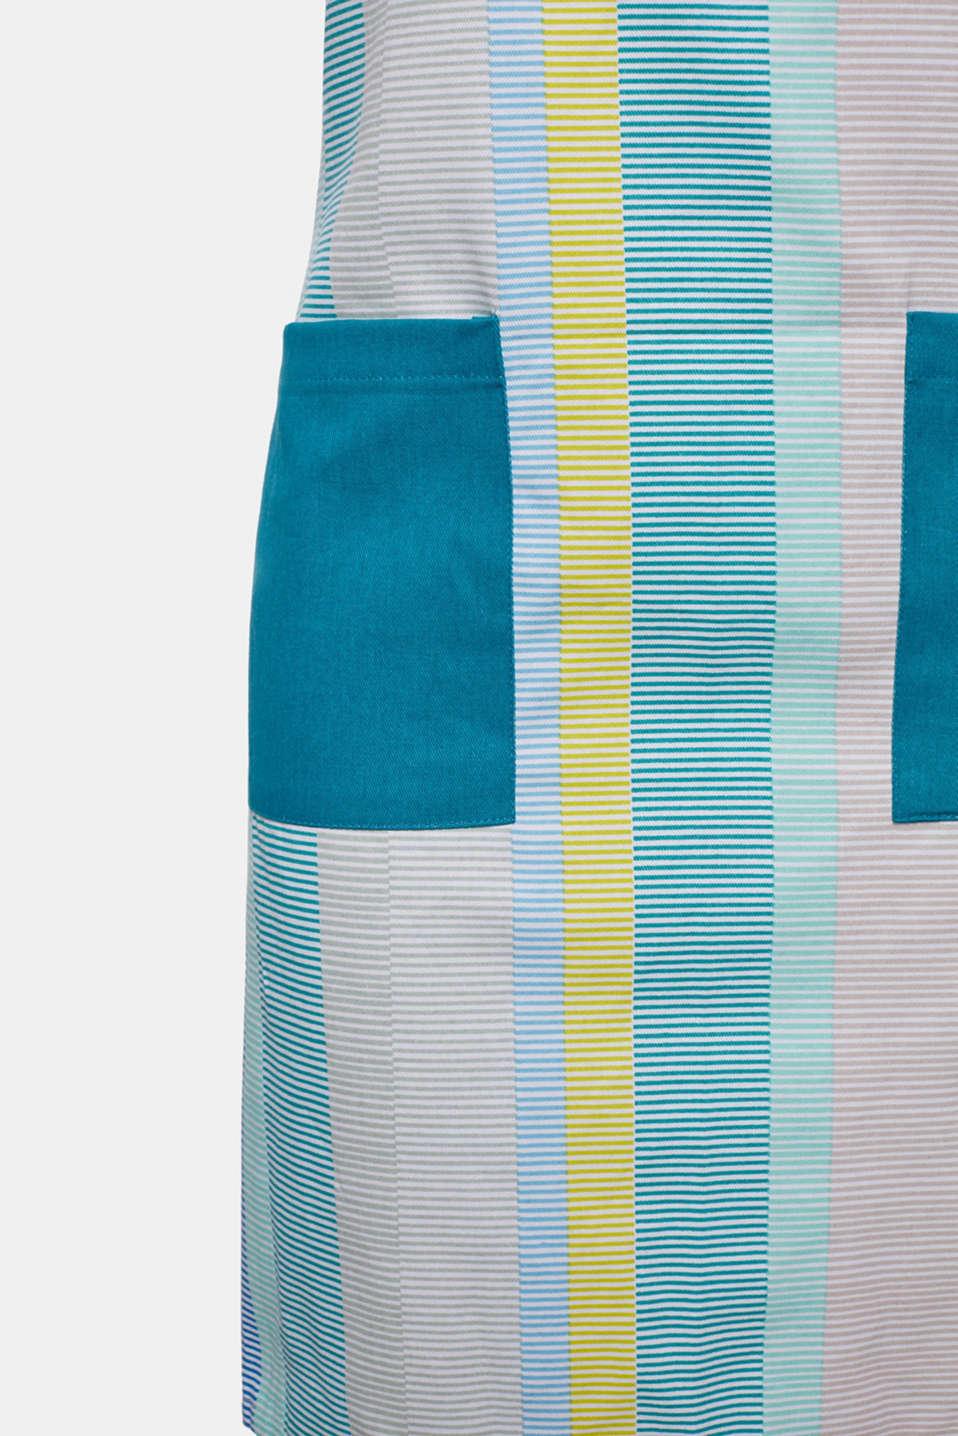 Apron with stripes, 100% cotton, BLUE MINT, detail image number 1